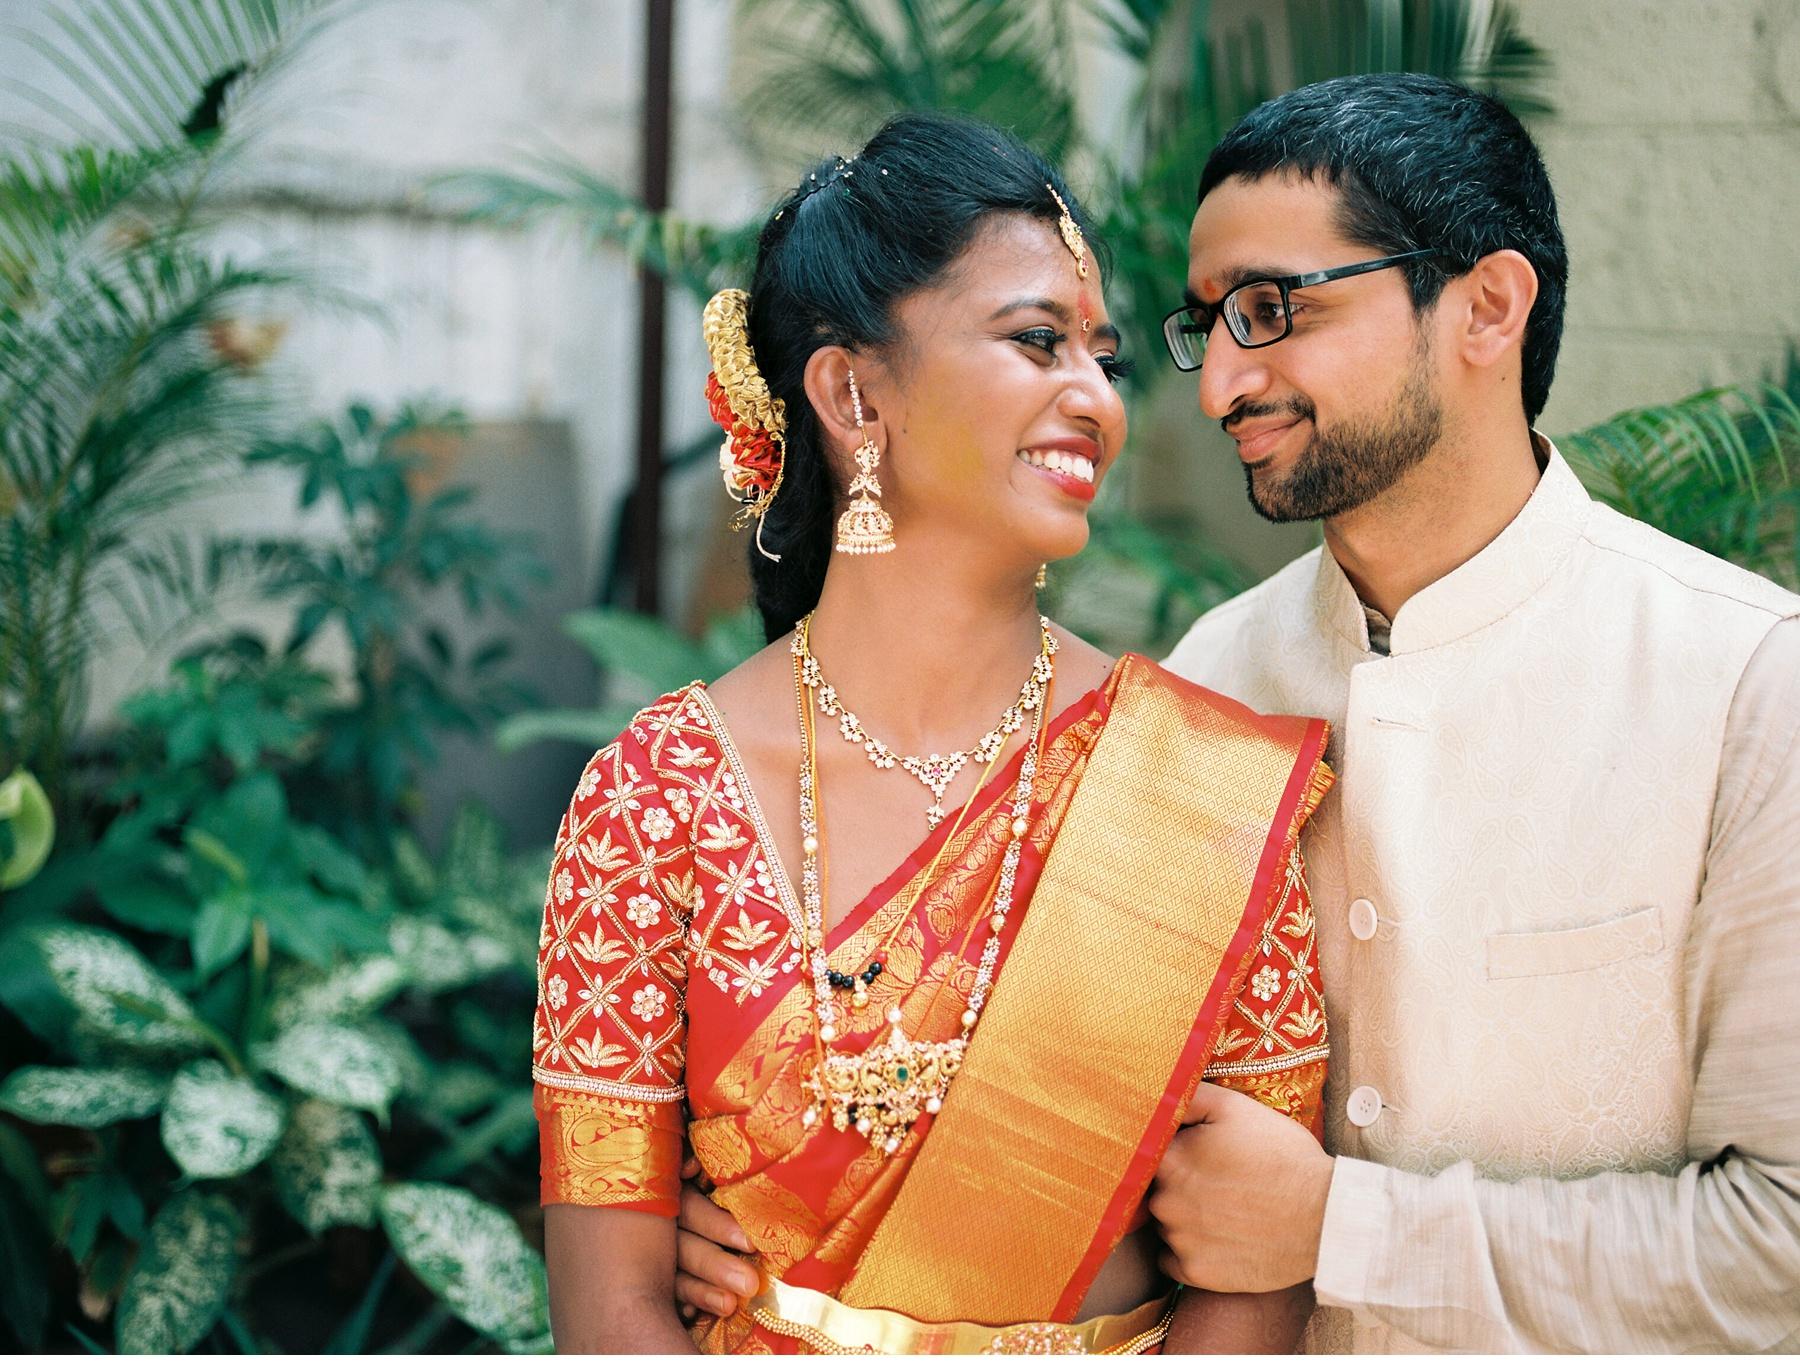 Southern_India_Wedding_Ceremony_0015.jpg